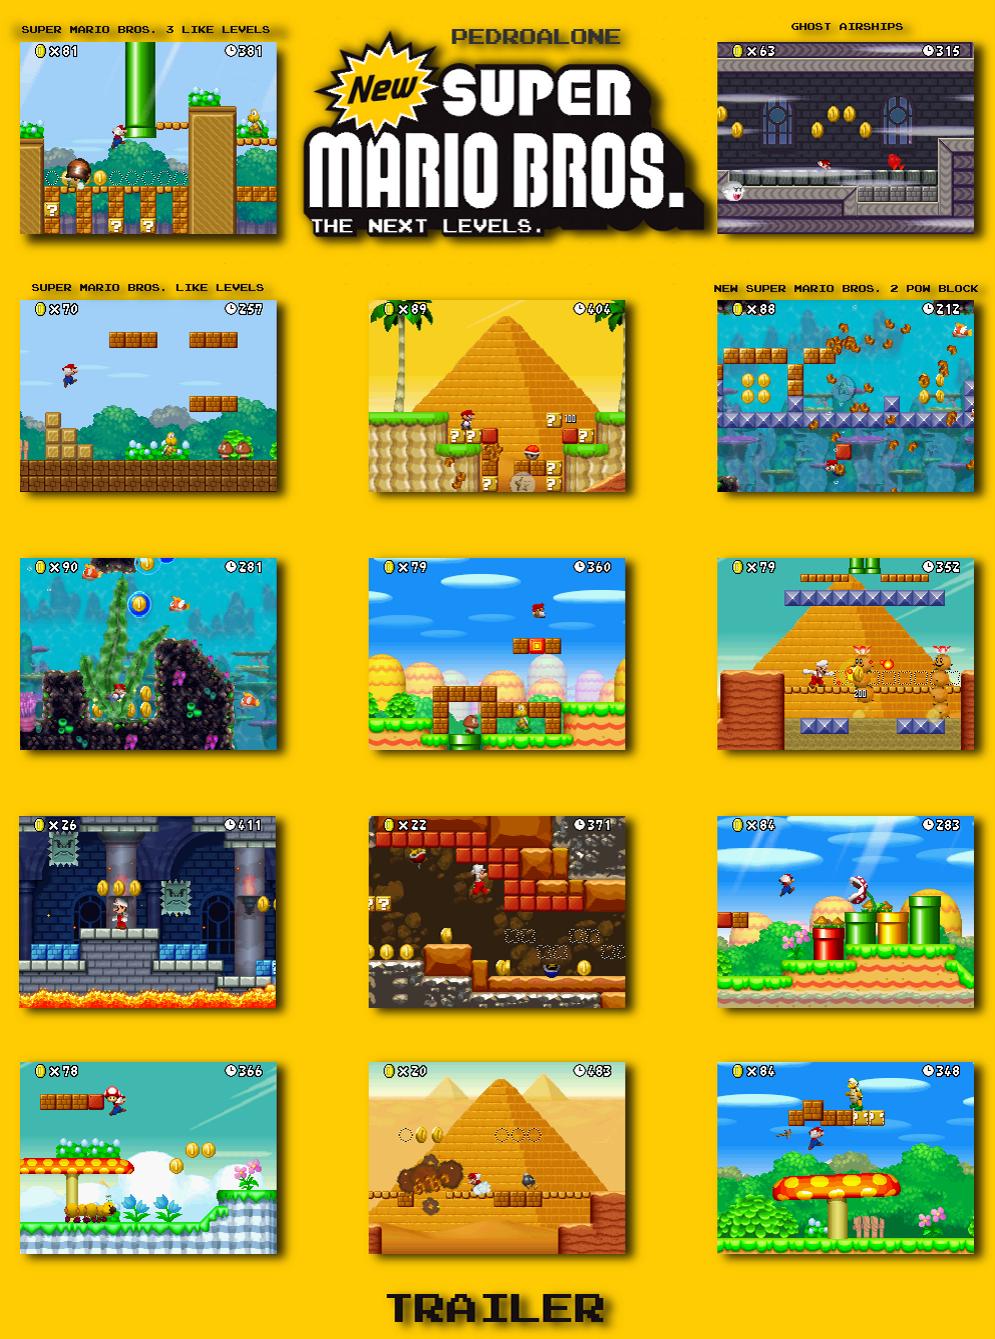 The NSMB Hacking Domain » New Super Mario Bros  The Next Levels